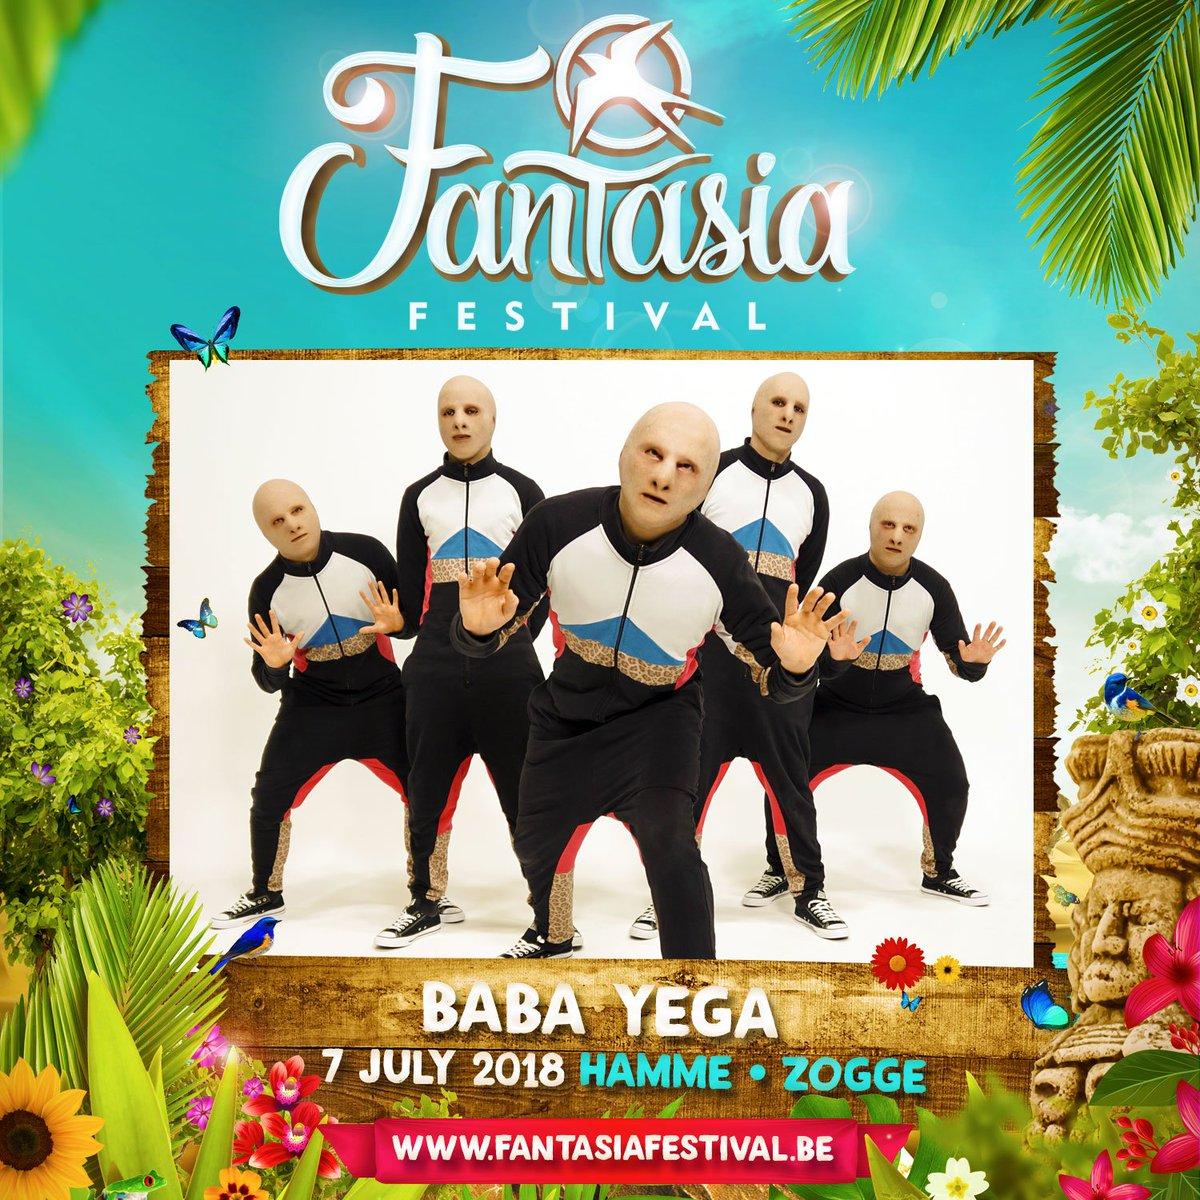 a113adefa Fantasia Festival on Twitter